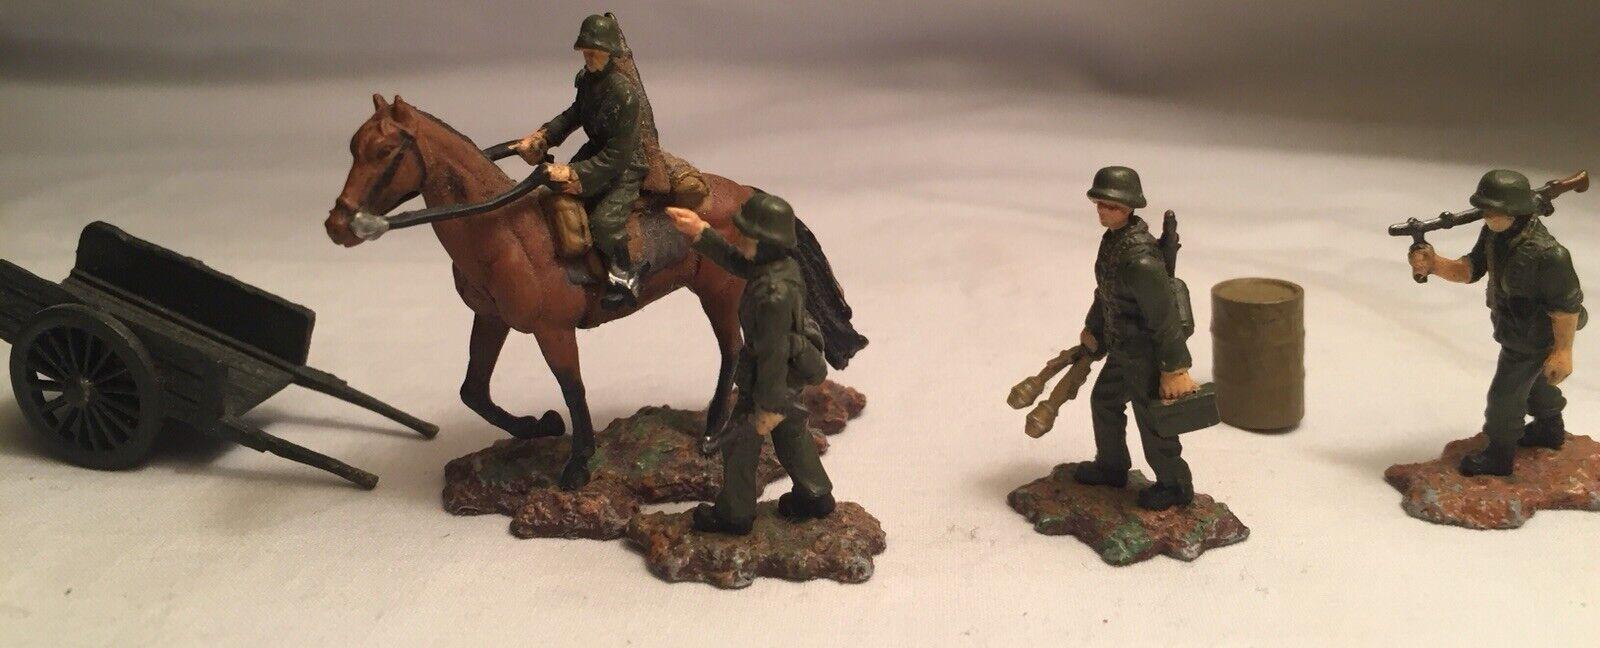 1 87 Scale Miniature WW2 Geruomo Soldiers  Horse Wagon MG42 cifras  vendita scontata online di factory outlet